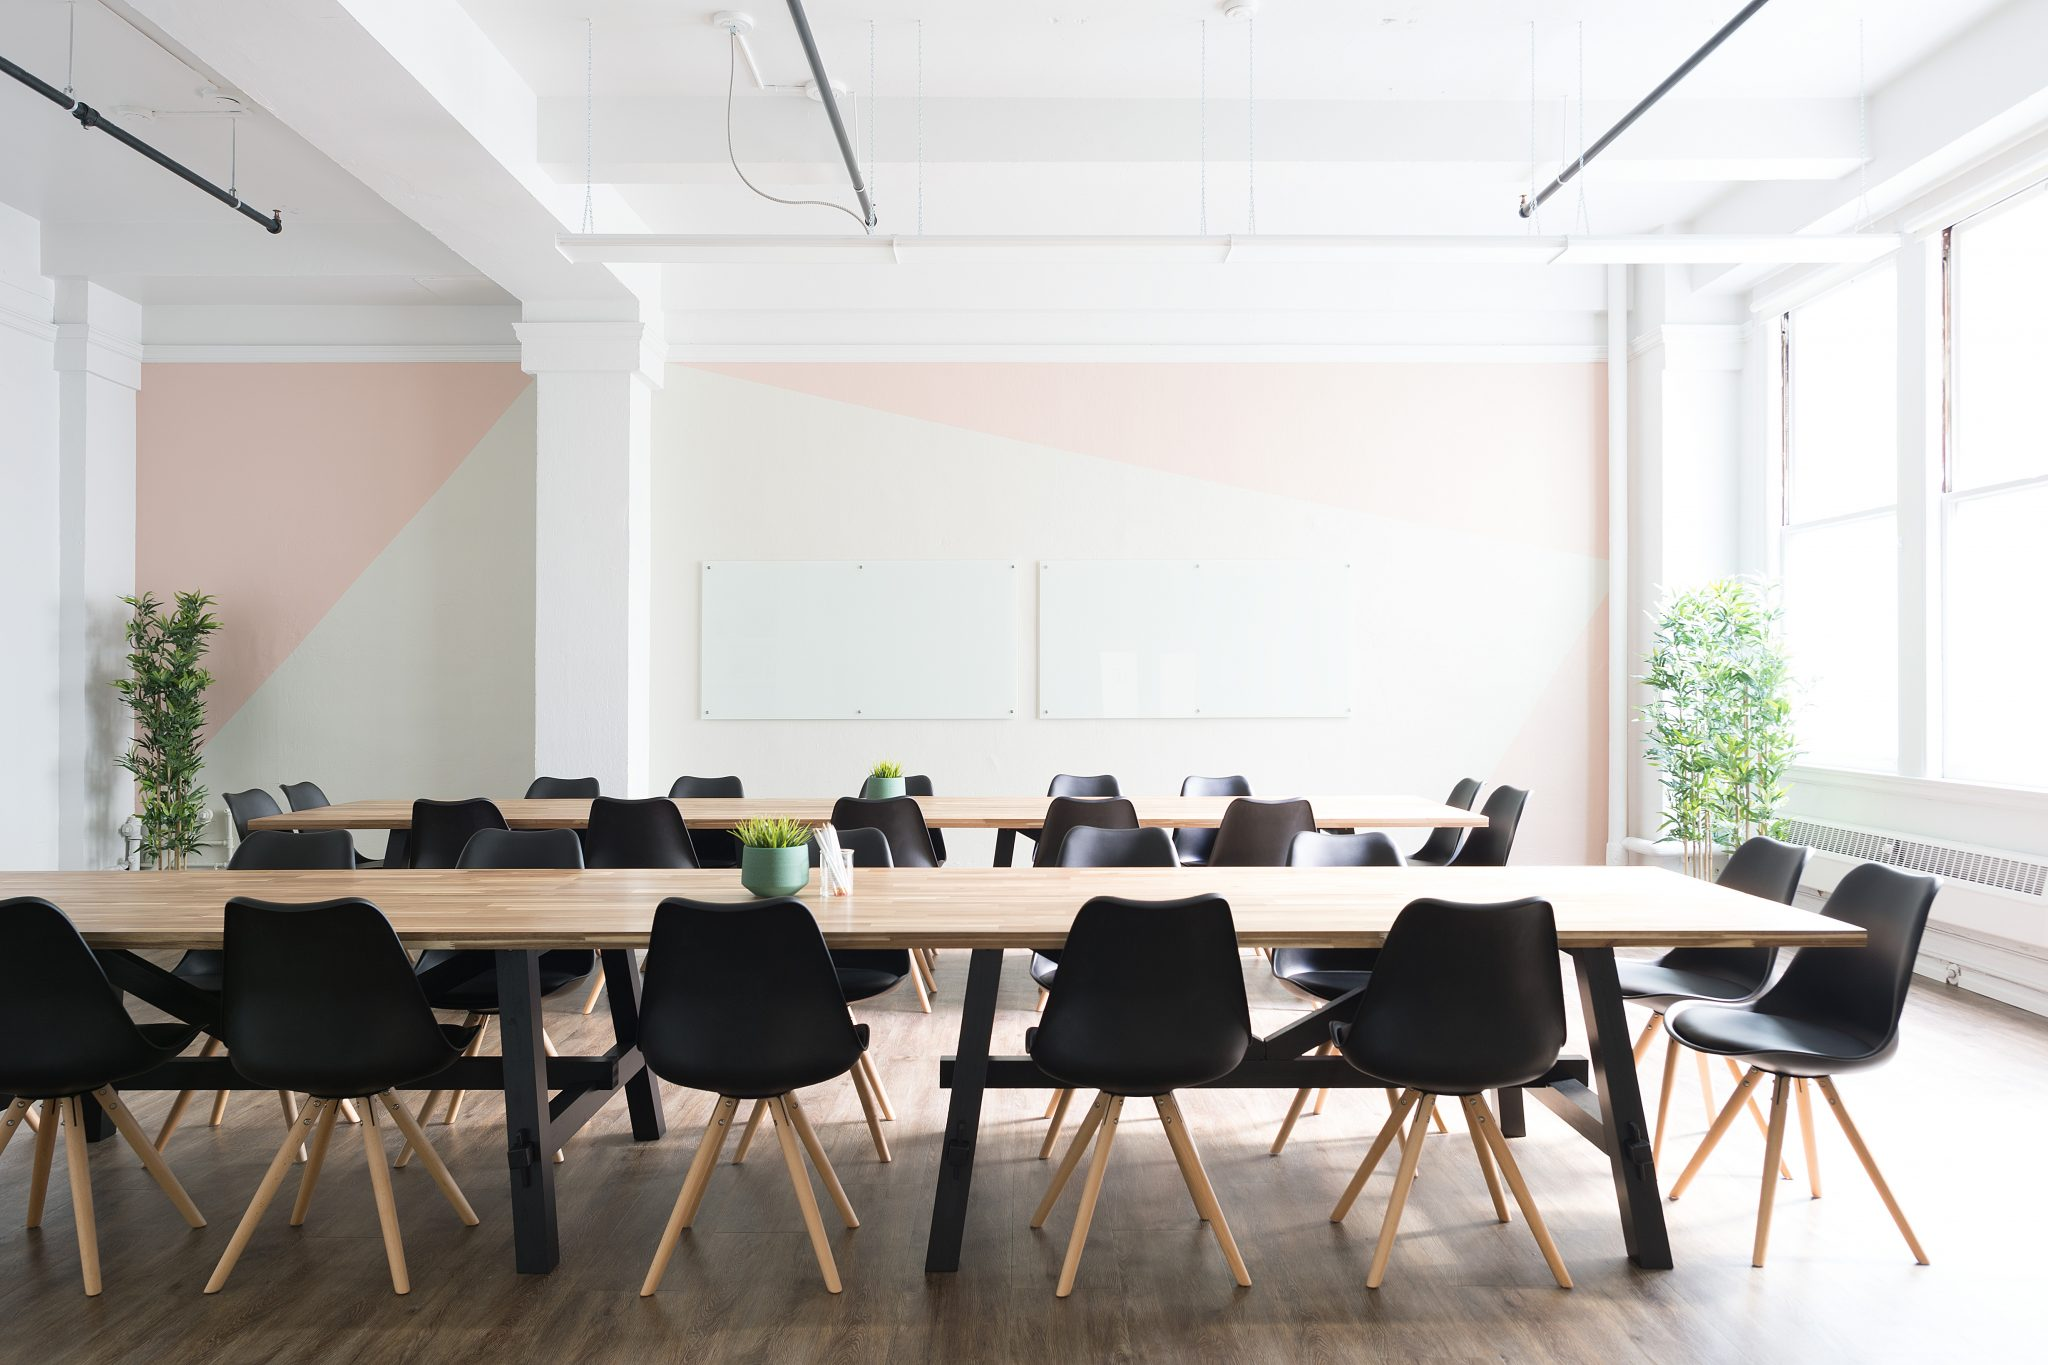 Meetings: Breakthrough Or Business As Usual?